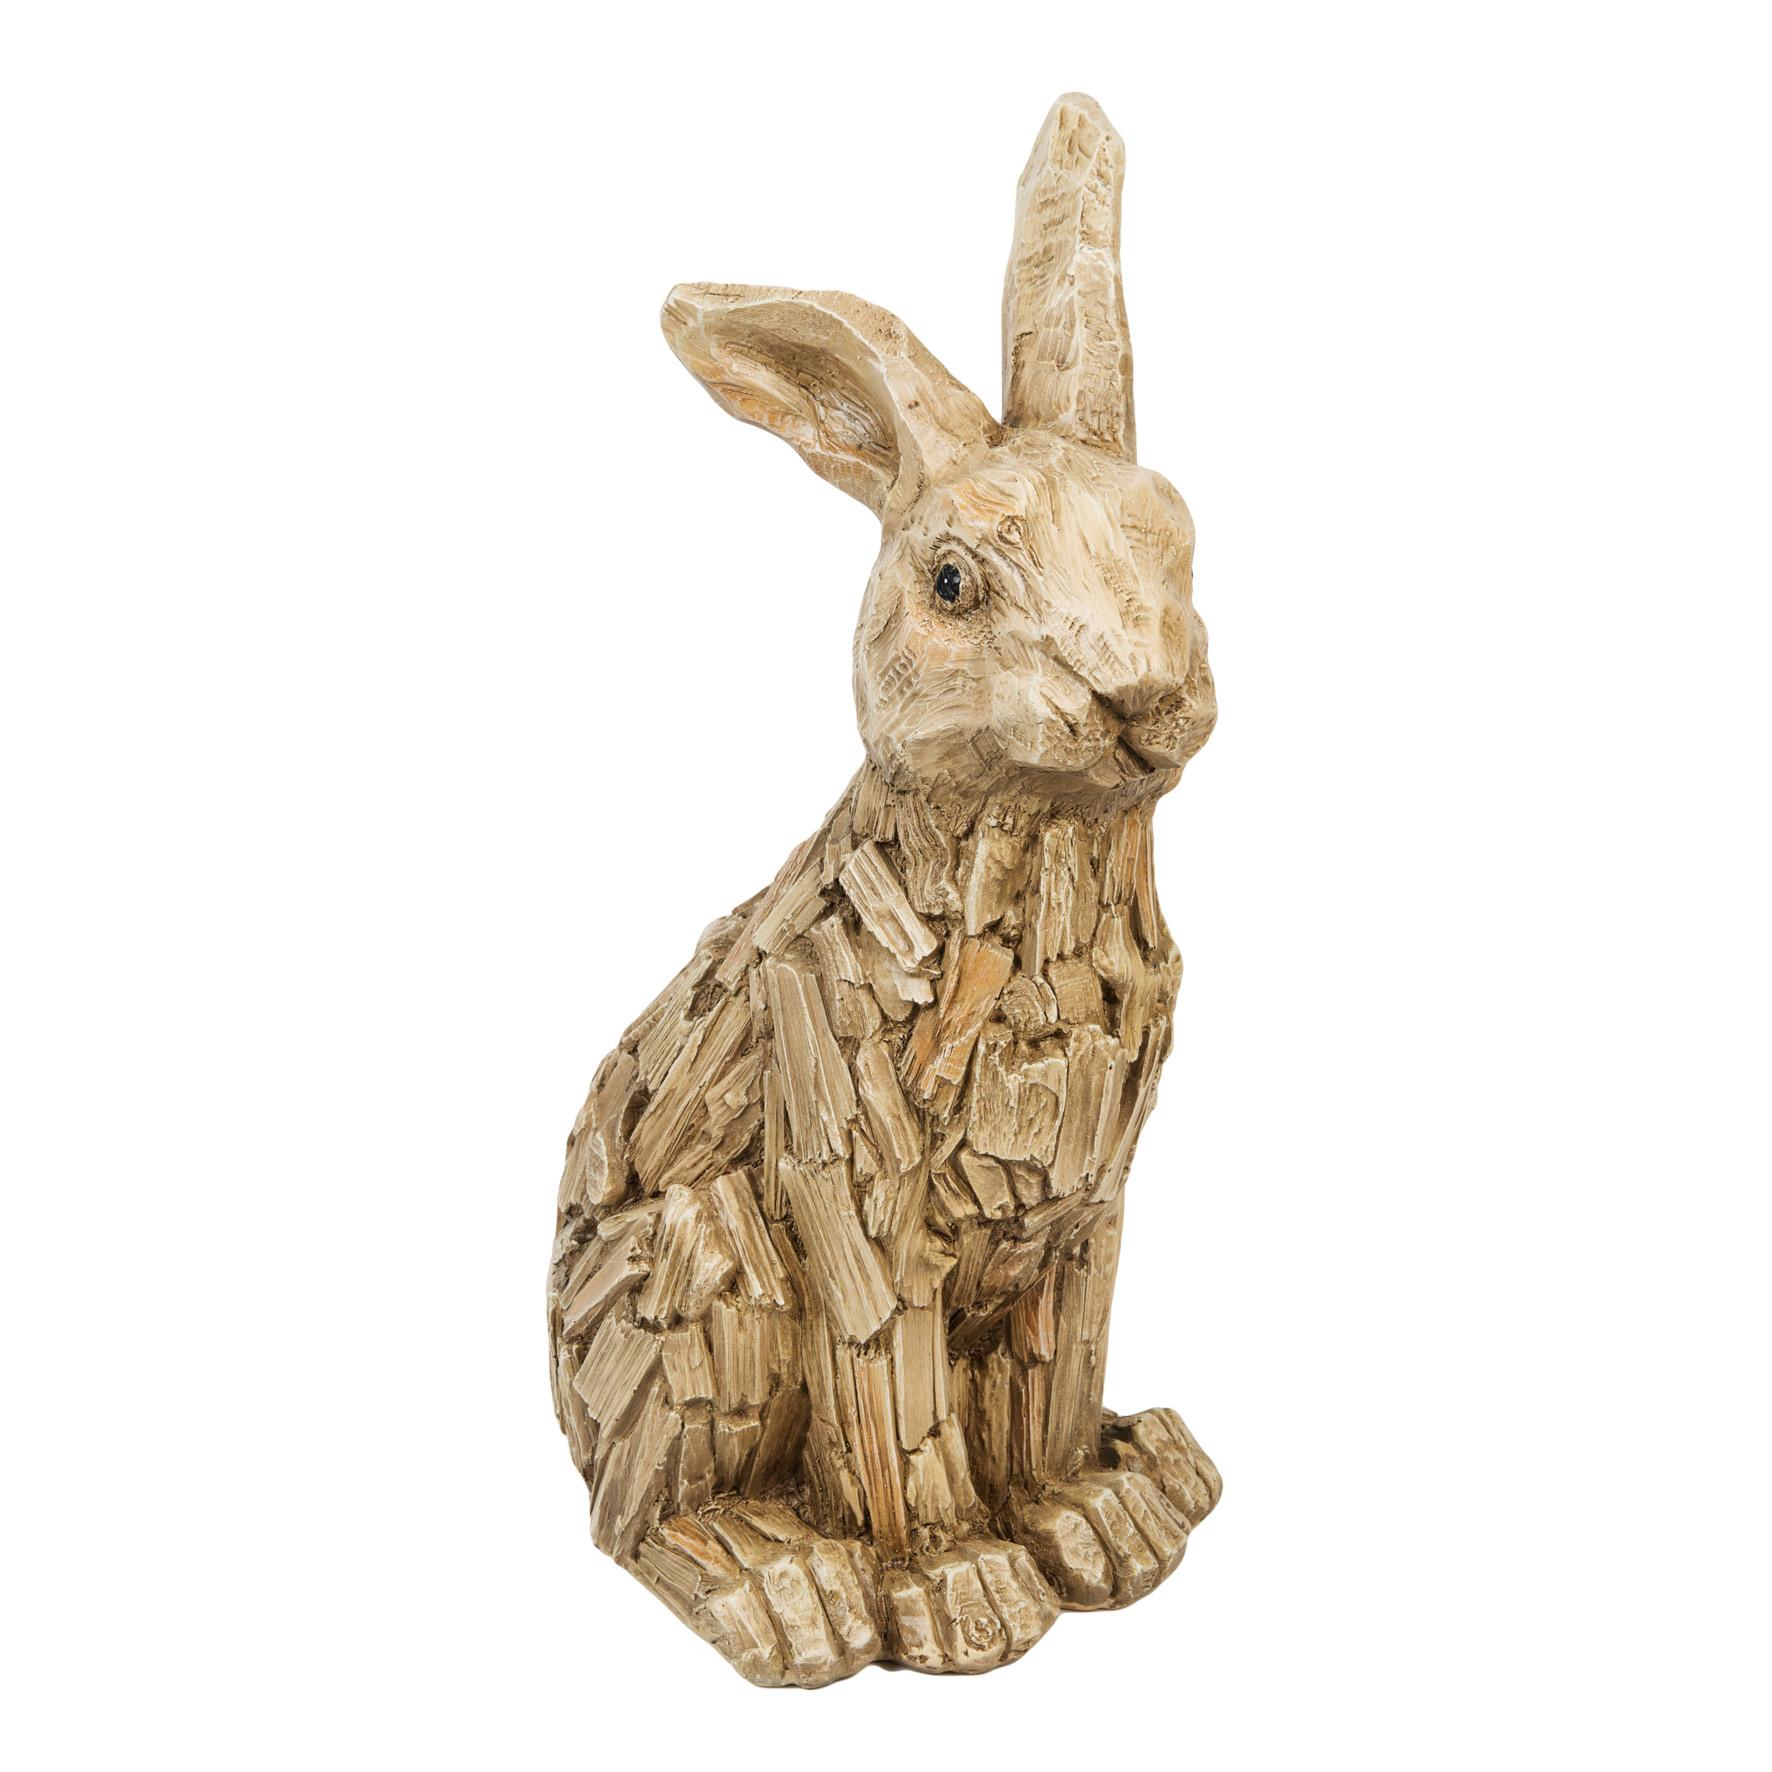 Large Sitting Hare Statue Rabbit Bunny Garden Statue Ornament 46cm